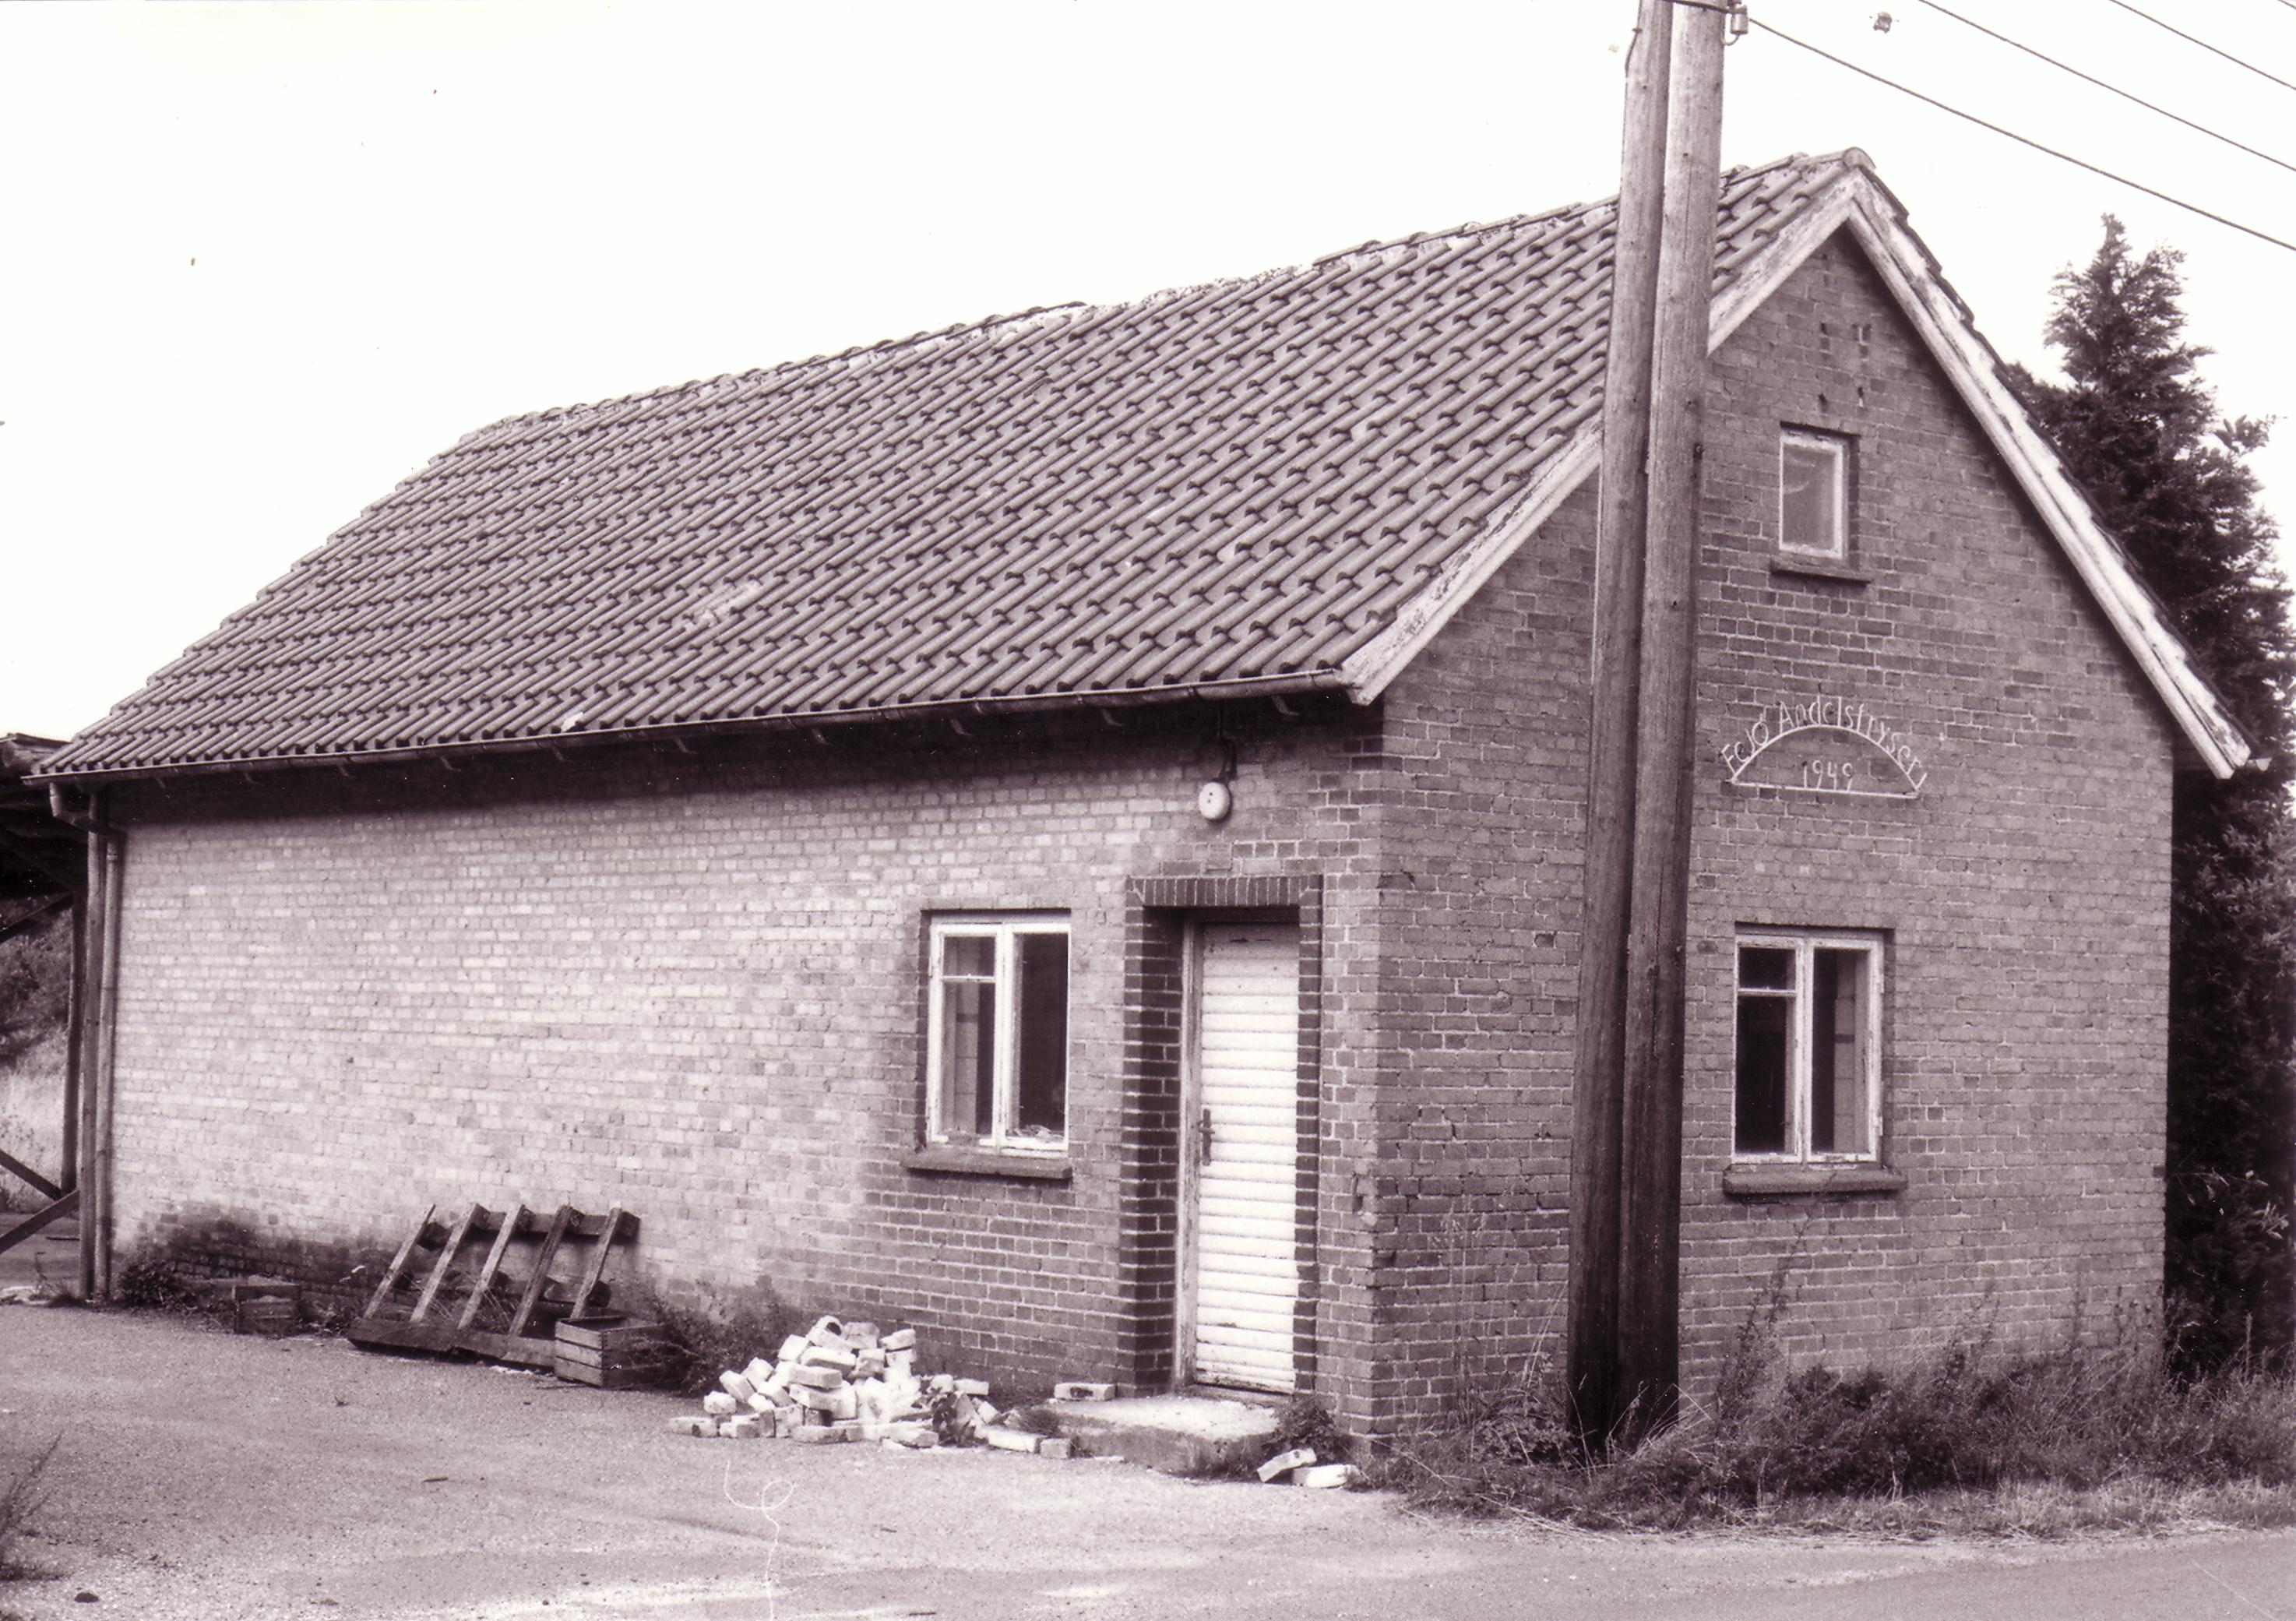 Herredsvej 199 - Andelsfrysehuset far 1959